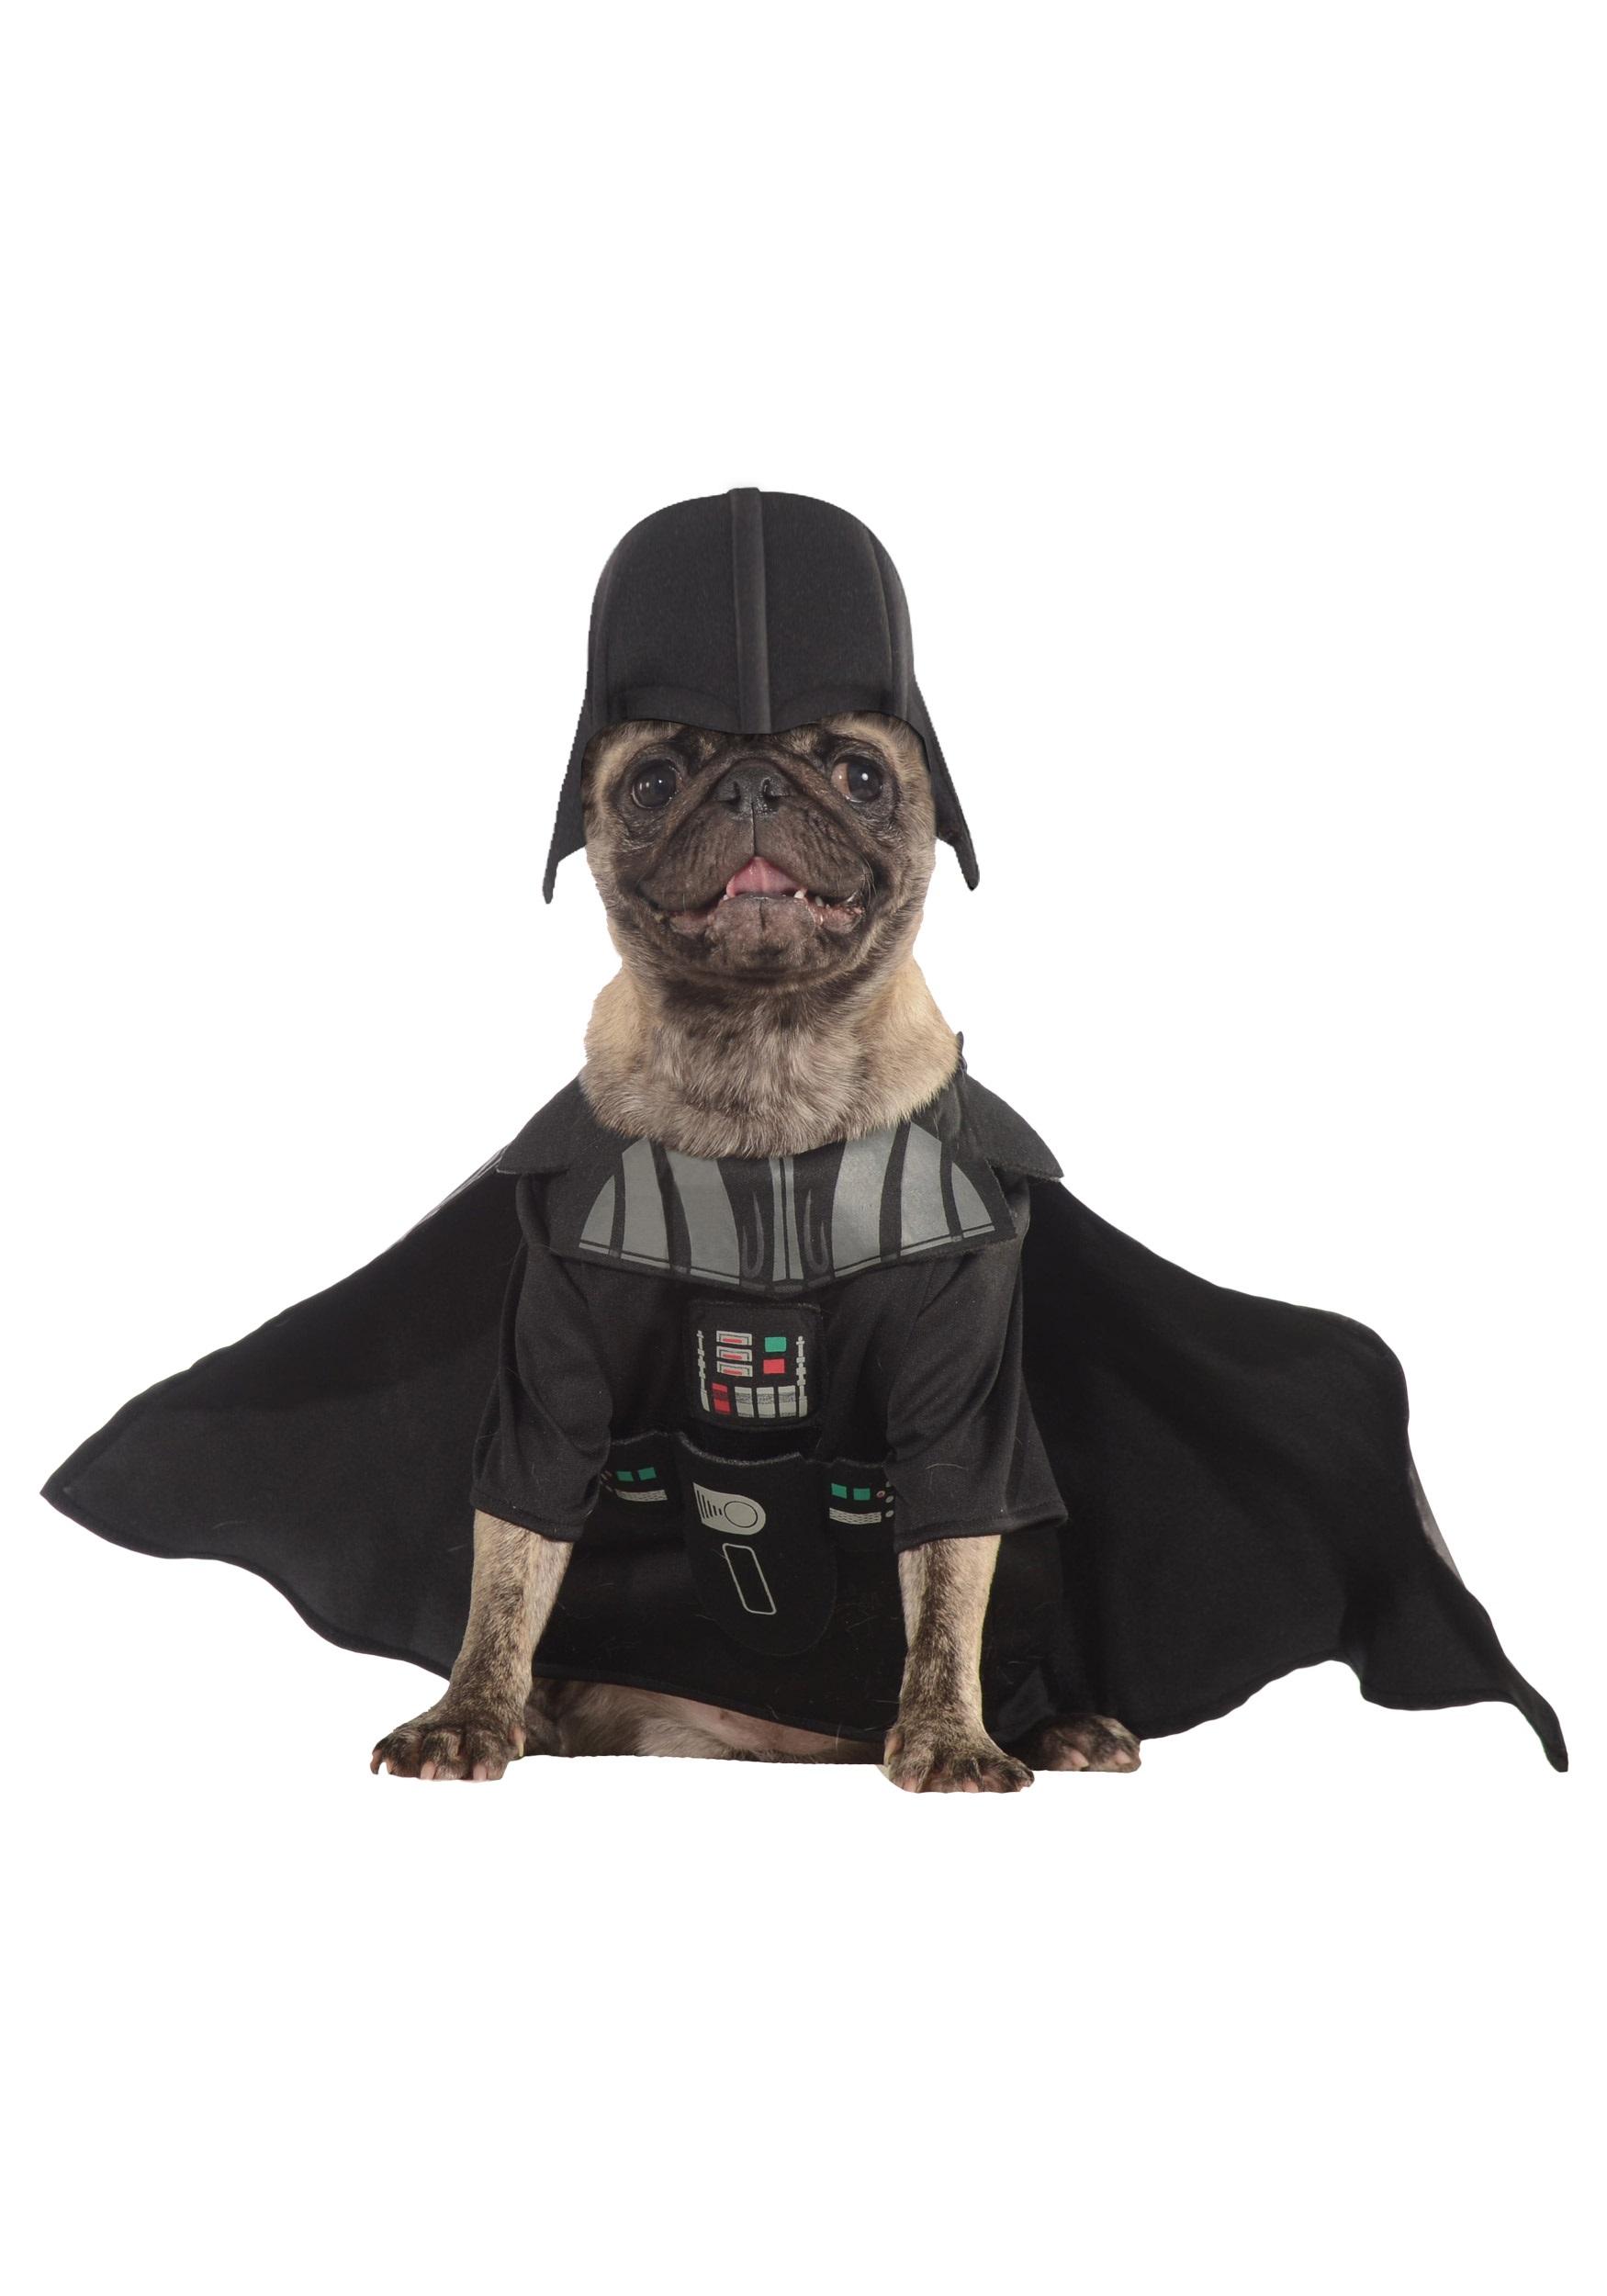 Pet Darth Vader Costume